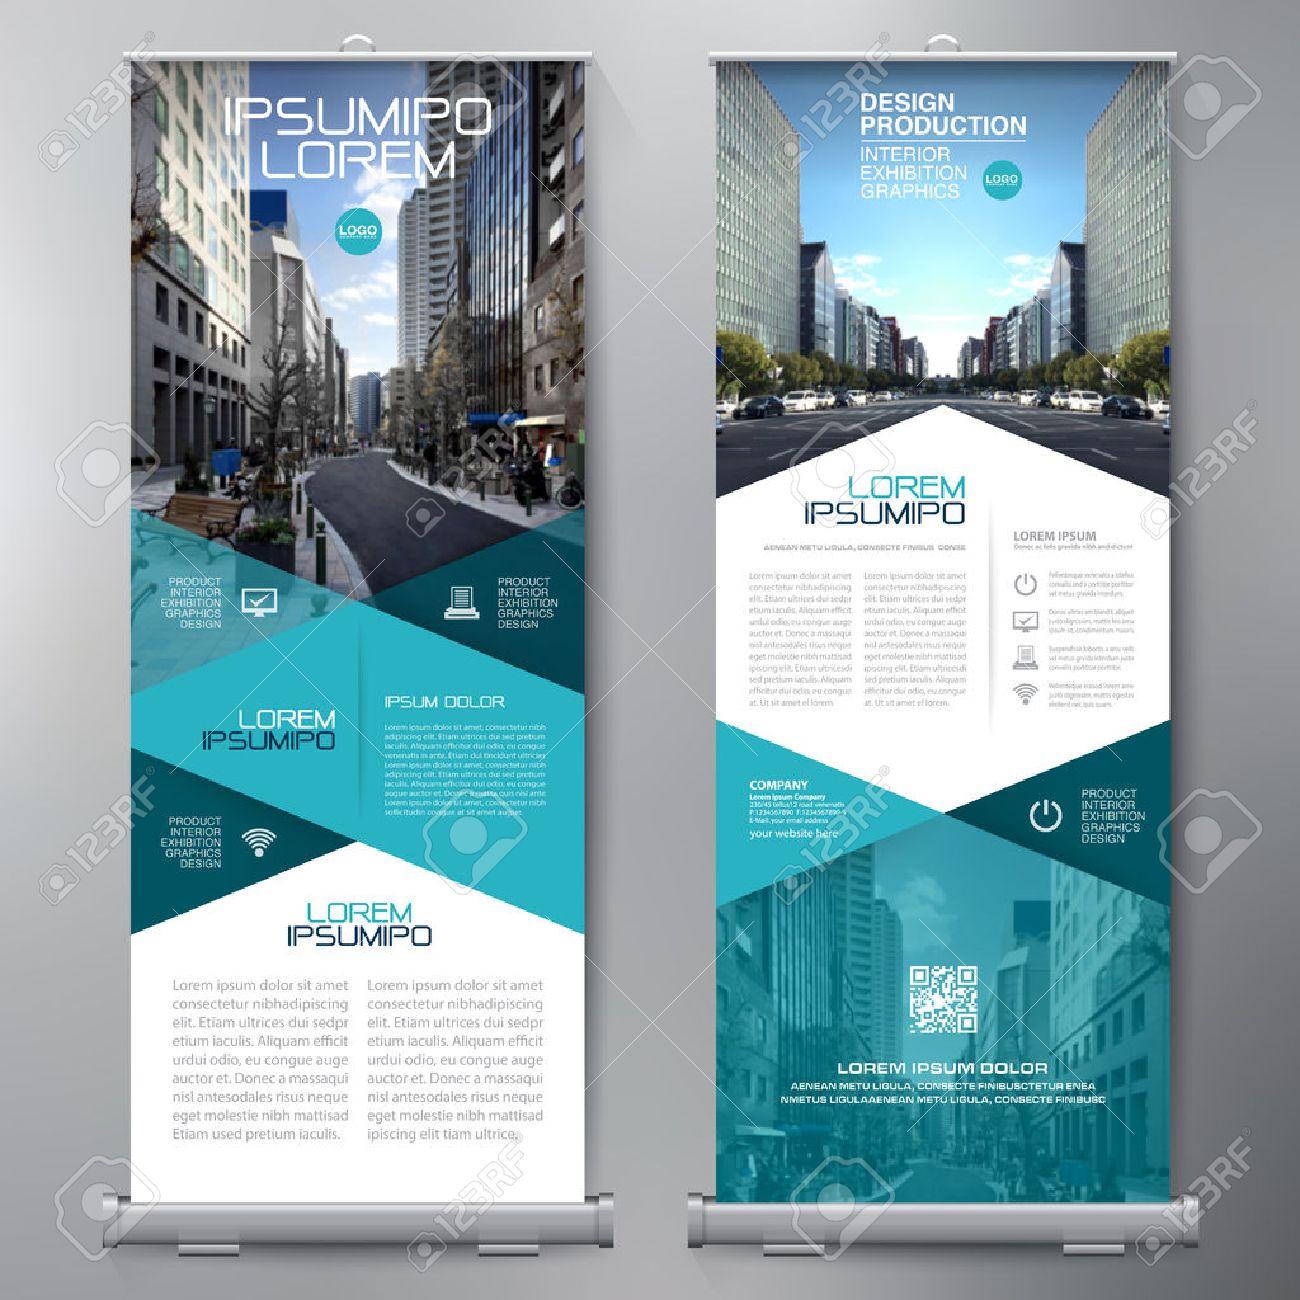 Business Roll Up. Standee Design. Banner Template. Presentation and Brochure Flyer. Vector illustration - 72453213